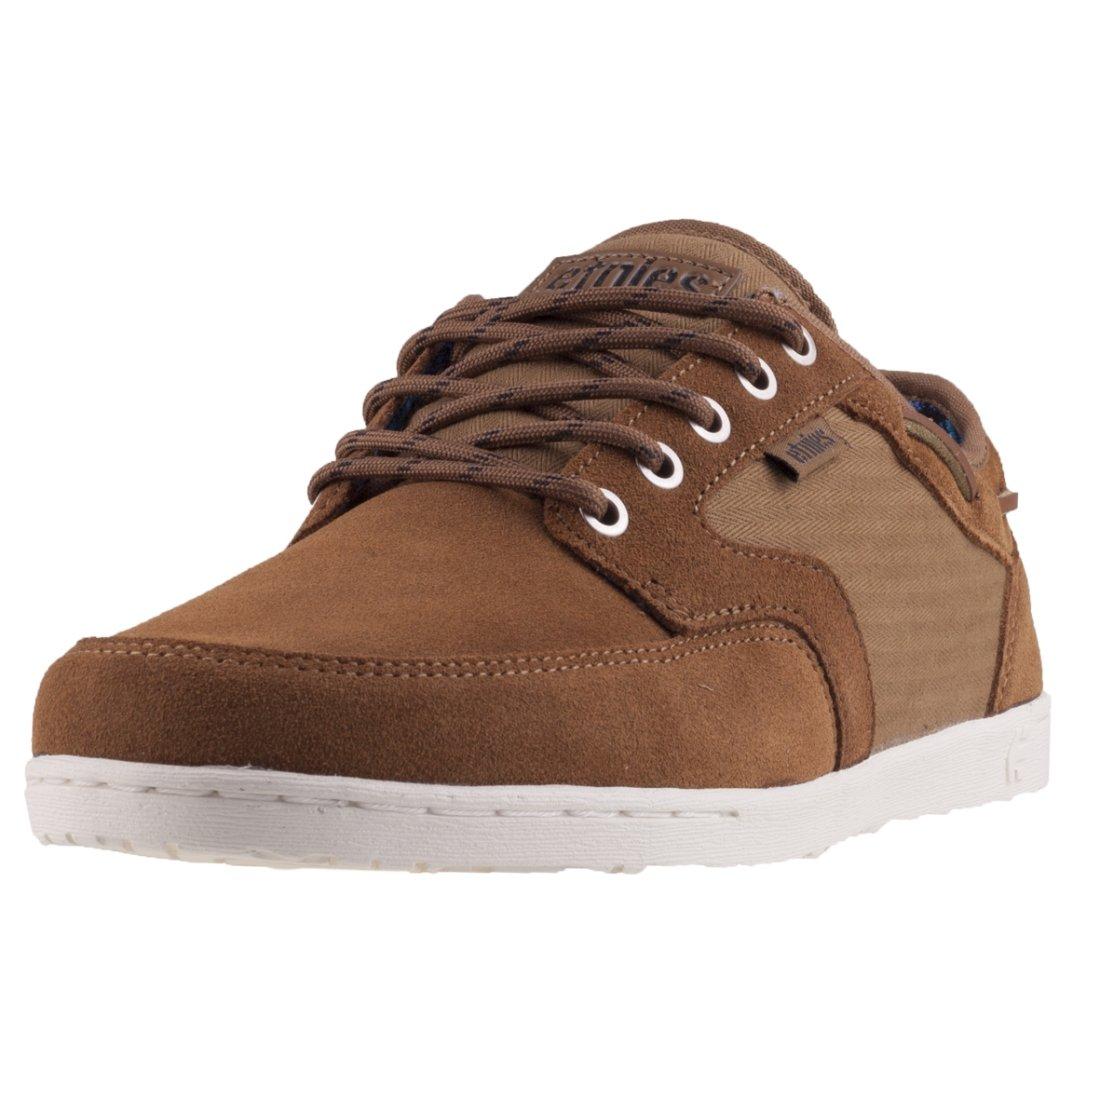 Etnies Dory 4101000401-488 - Zapatillas de skate de lona para hombre 43 EU/9 UK/10 US|Brown/navy